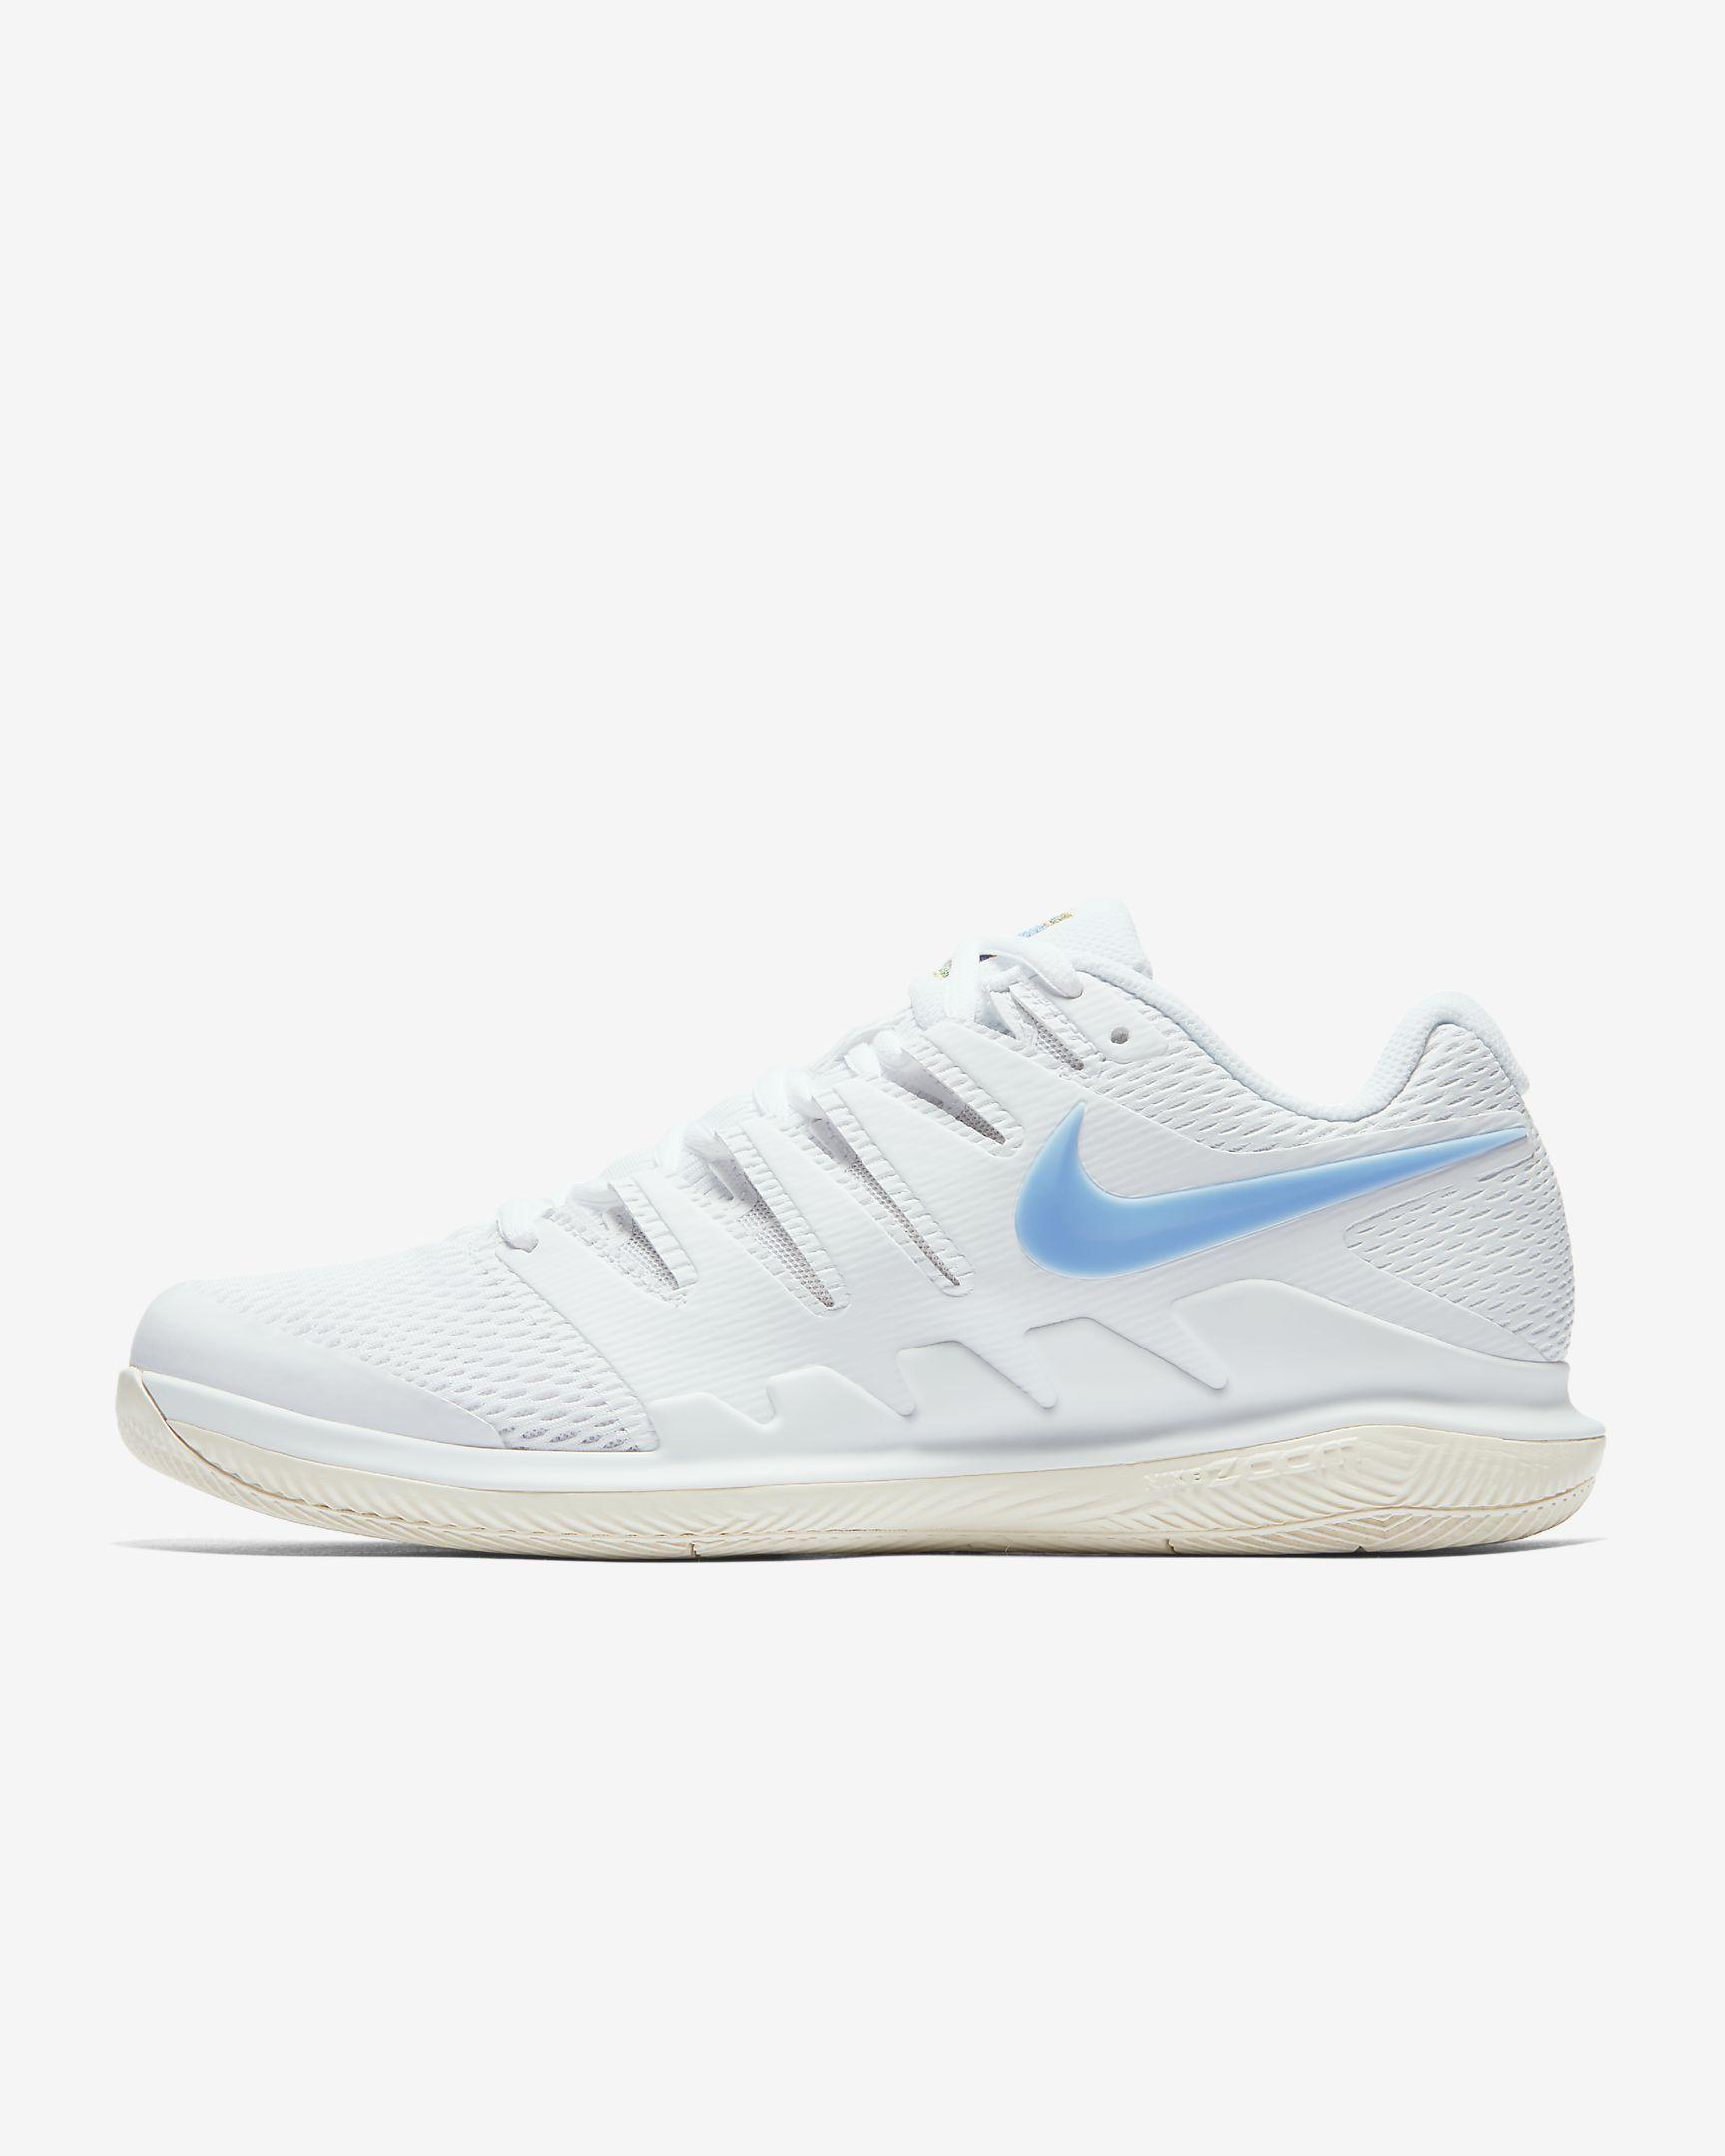 076d5ee18b07 NikeCourt Air Zoom Vapor X Men s Hard Court Tennis Shoe